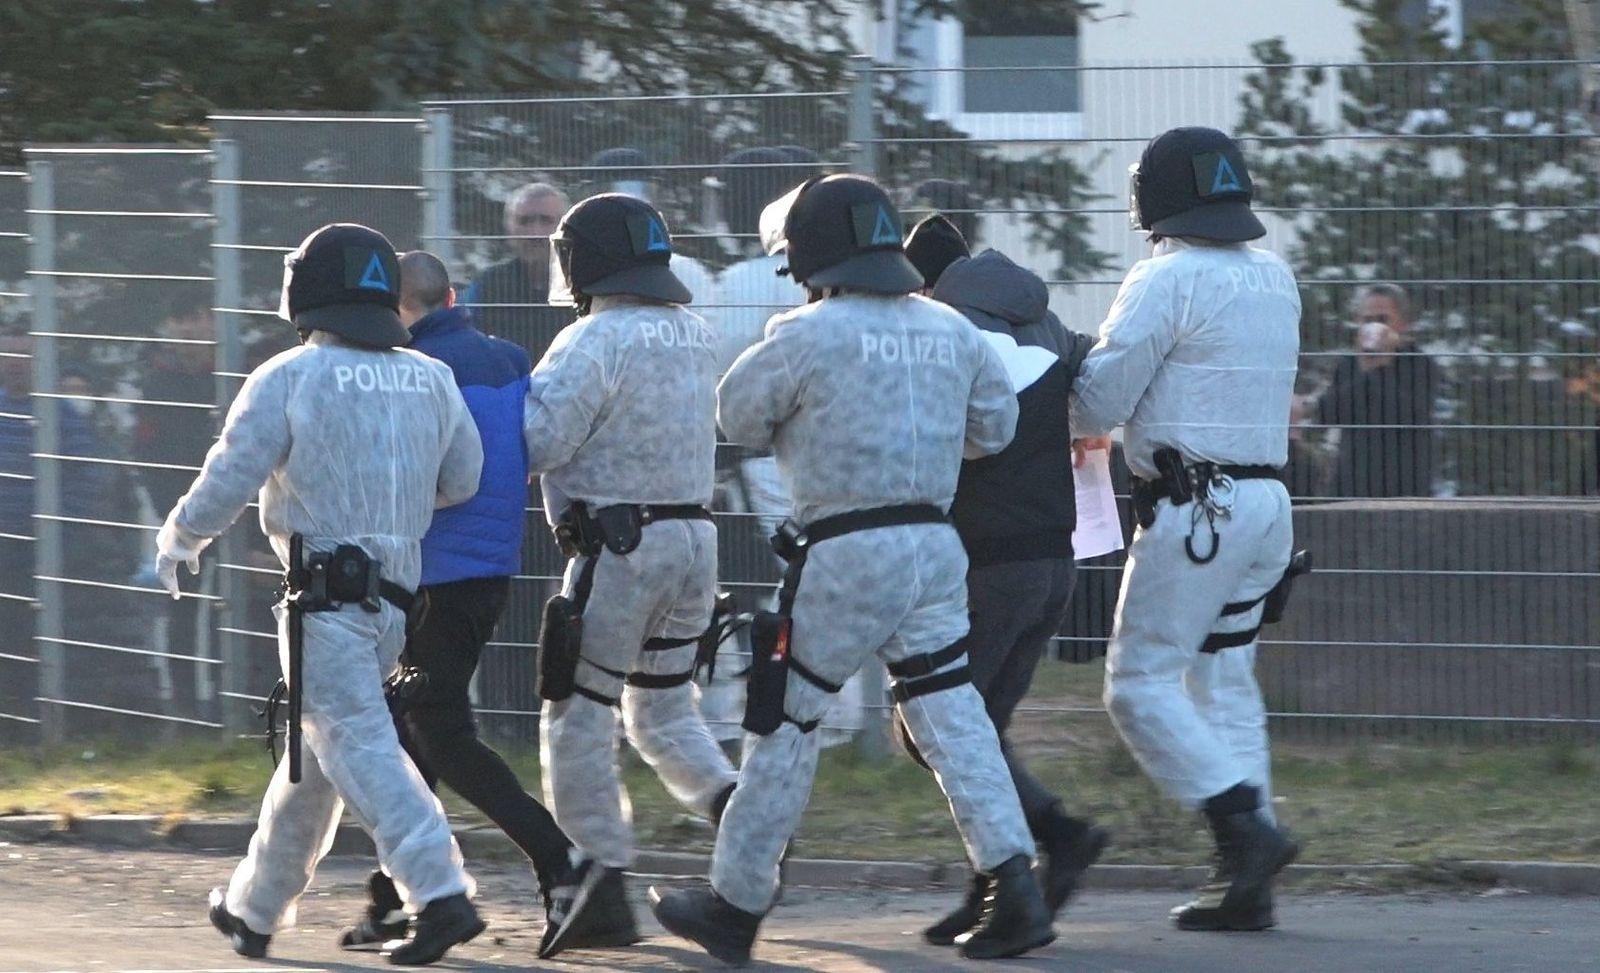 Wegen Unruhen nach Coronafall: Polizei verlegt Flüchtlinge